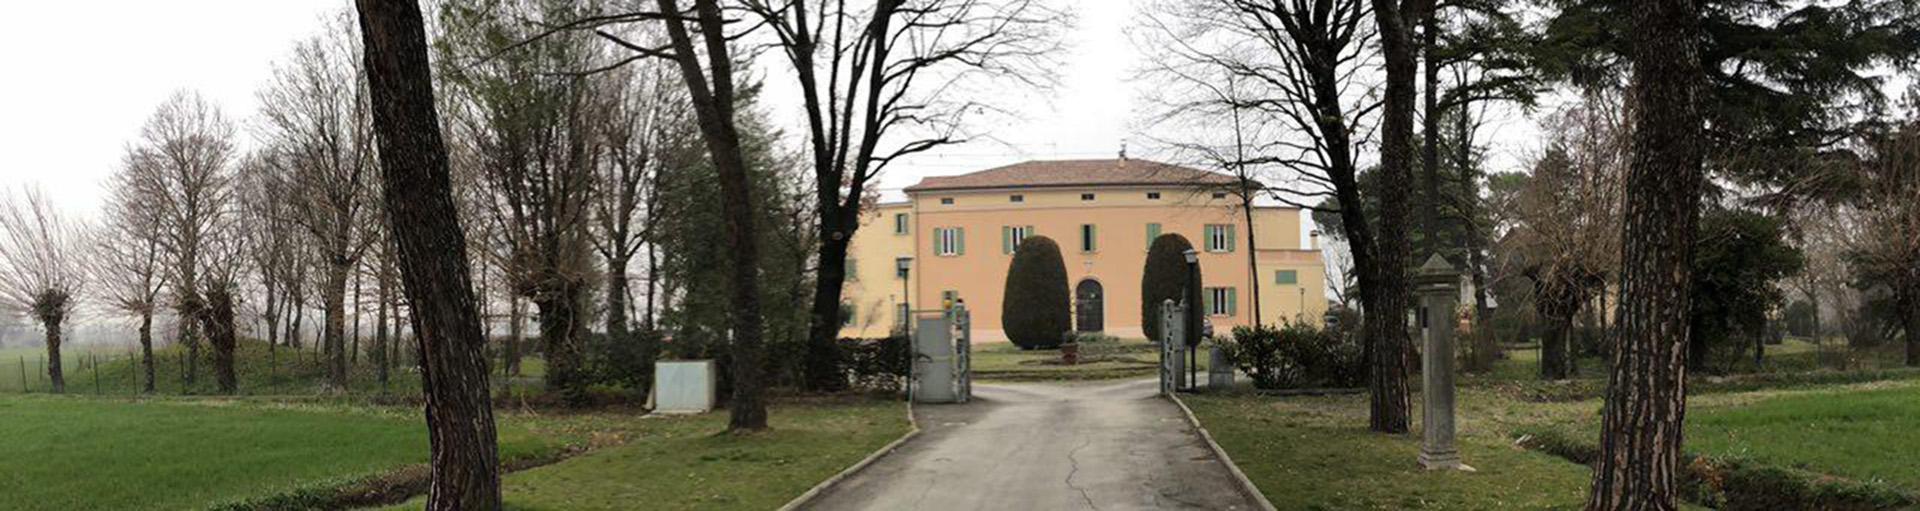 Suore Francescane Adoratrici